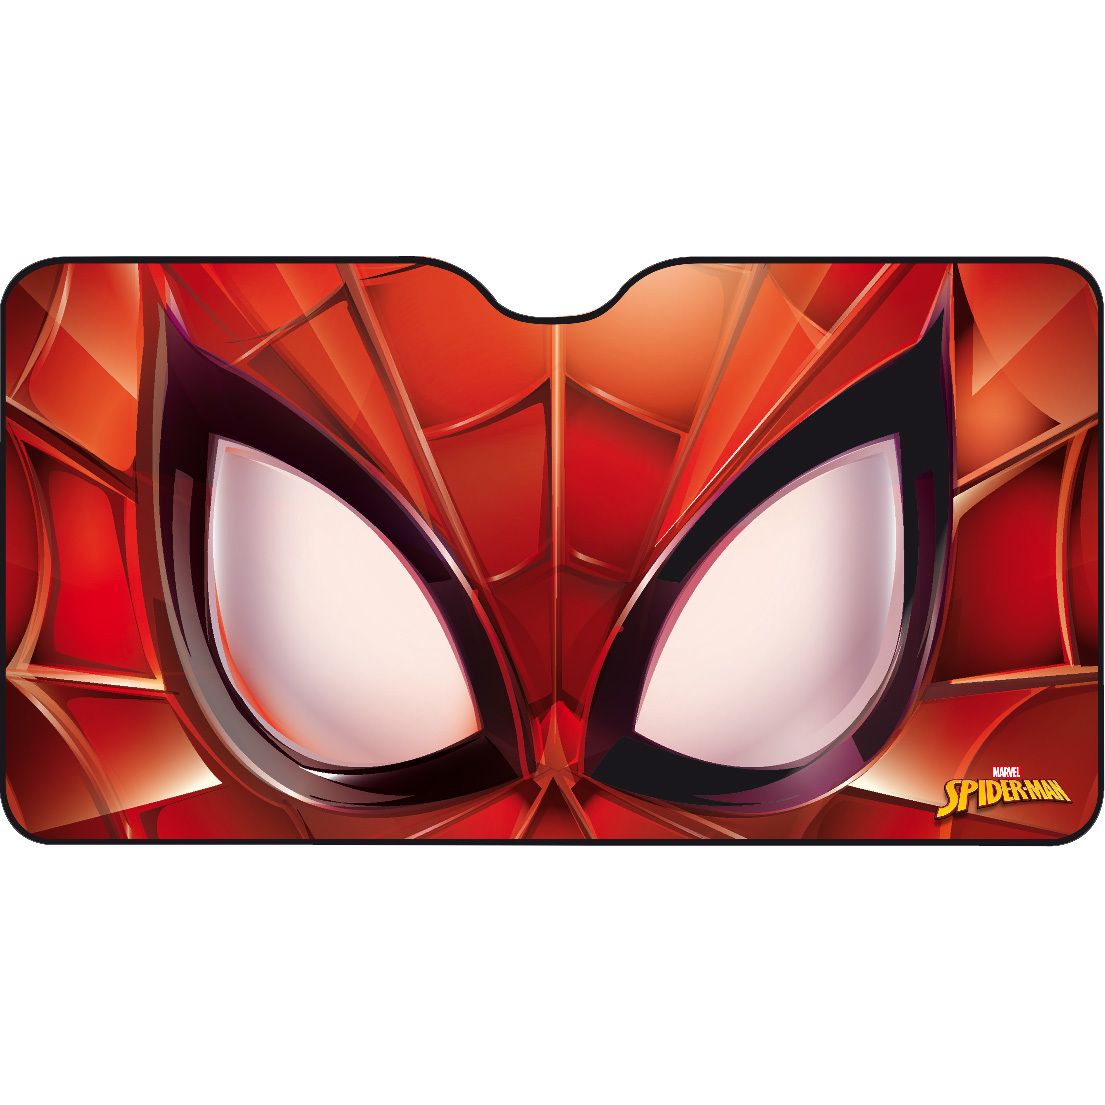 Parasolar pentru parbriz Spiderman Maxi 150x80 cm Disney CZ10257 imagine